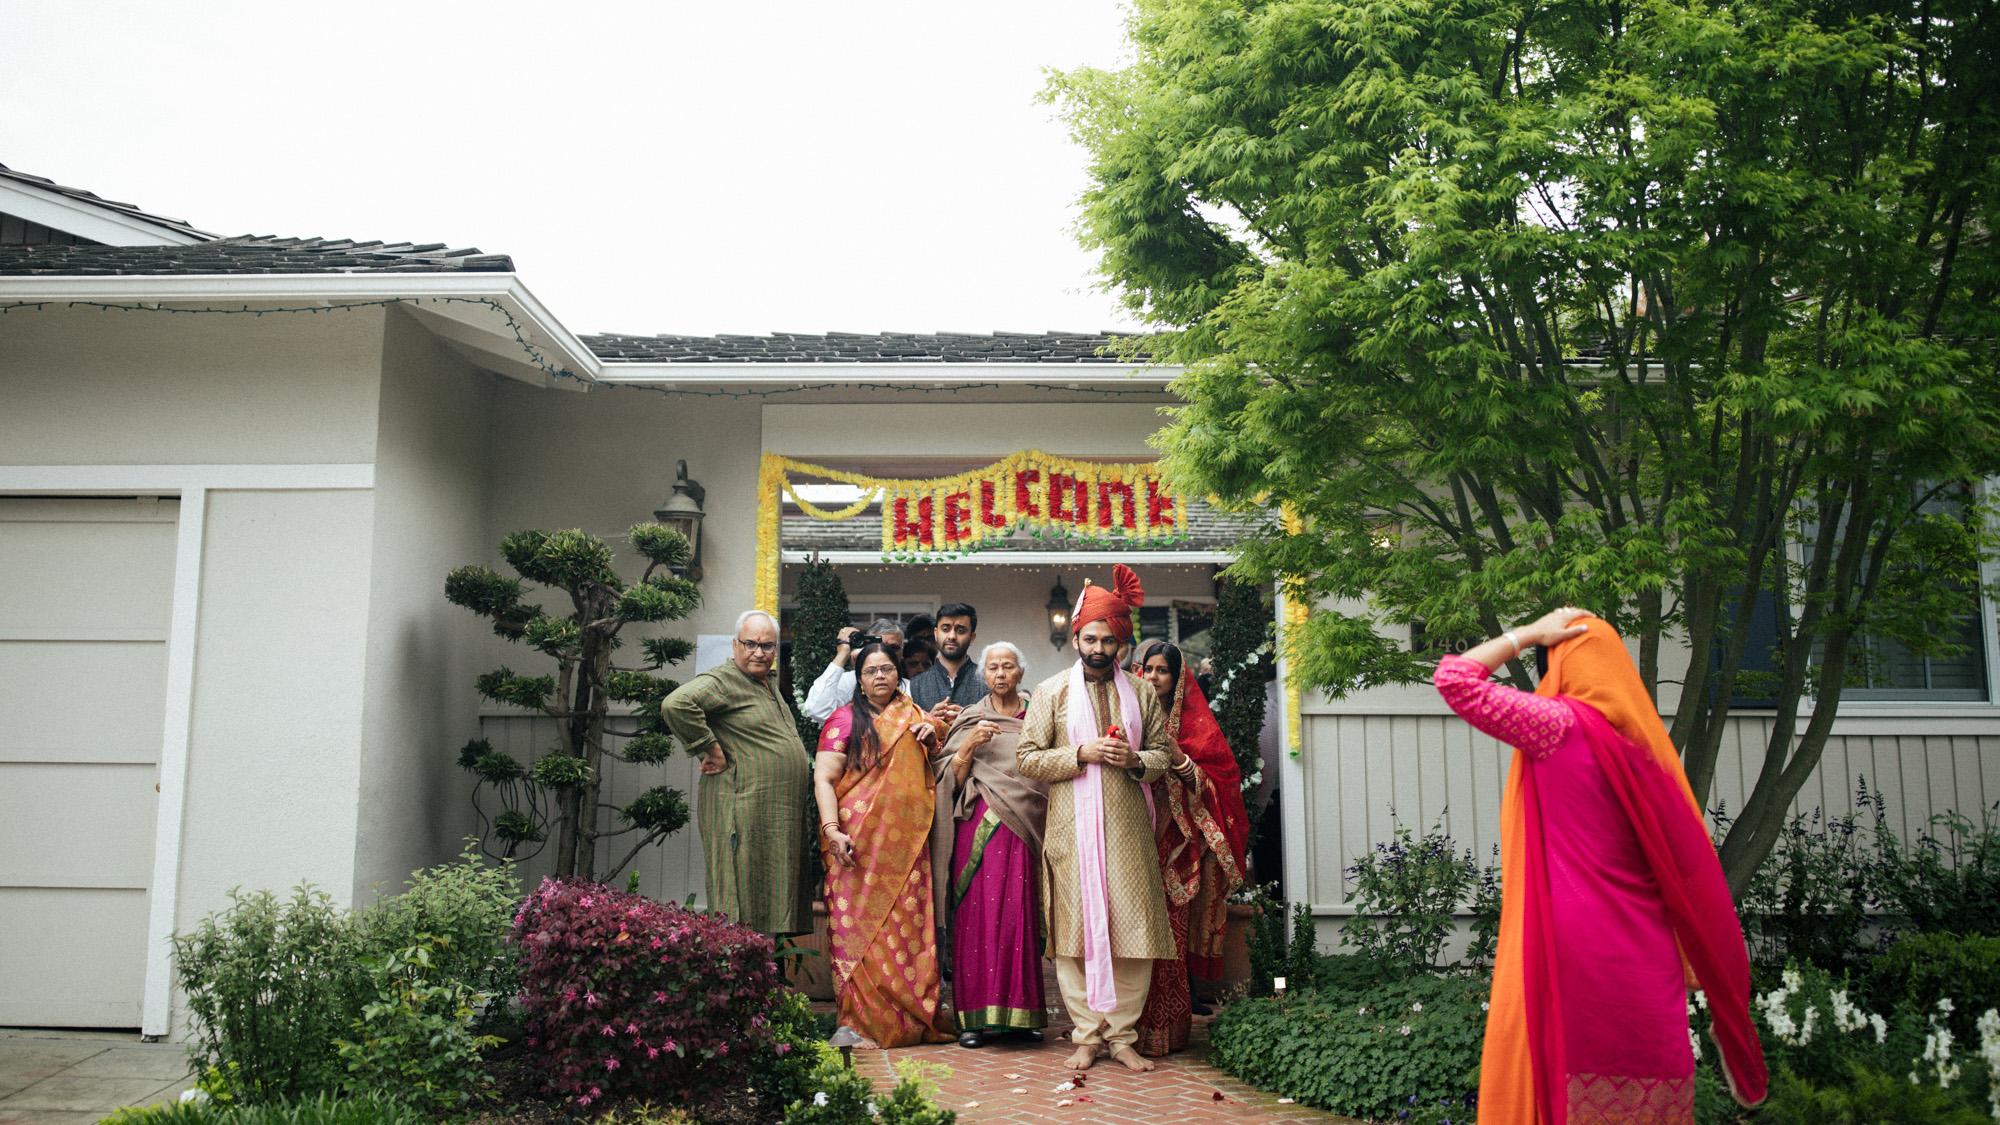 anu_maneesh_alec_vanderboom_Indian_wedding_photography-0206.jpg